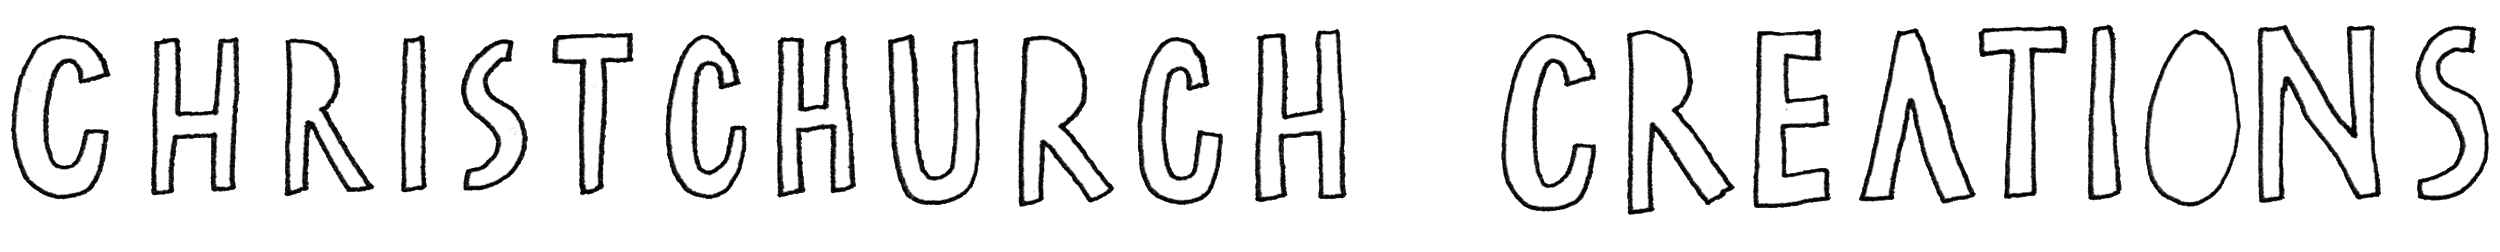 chchfinal.png